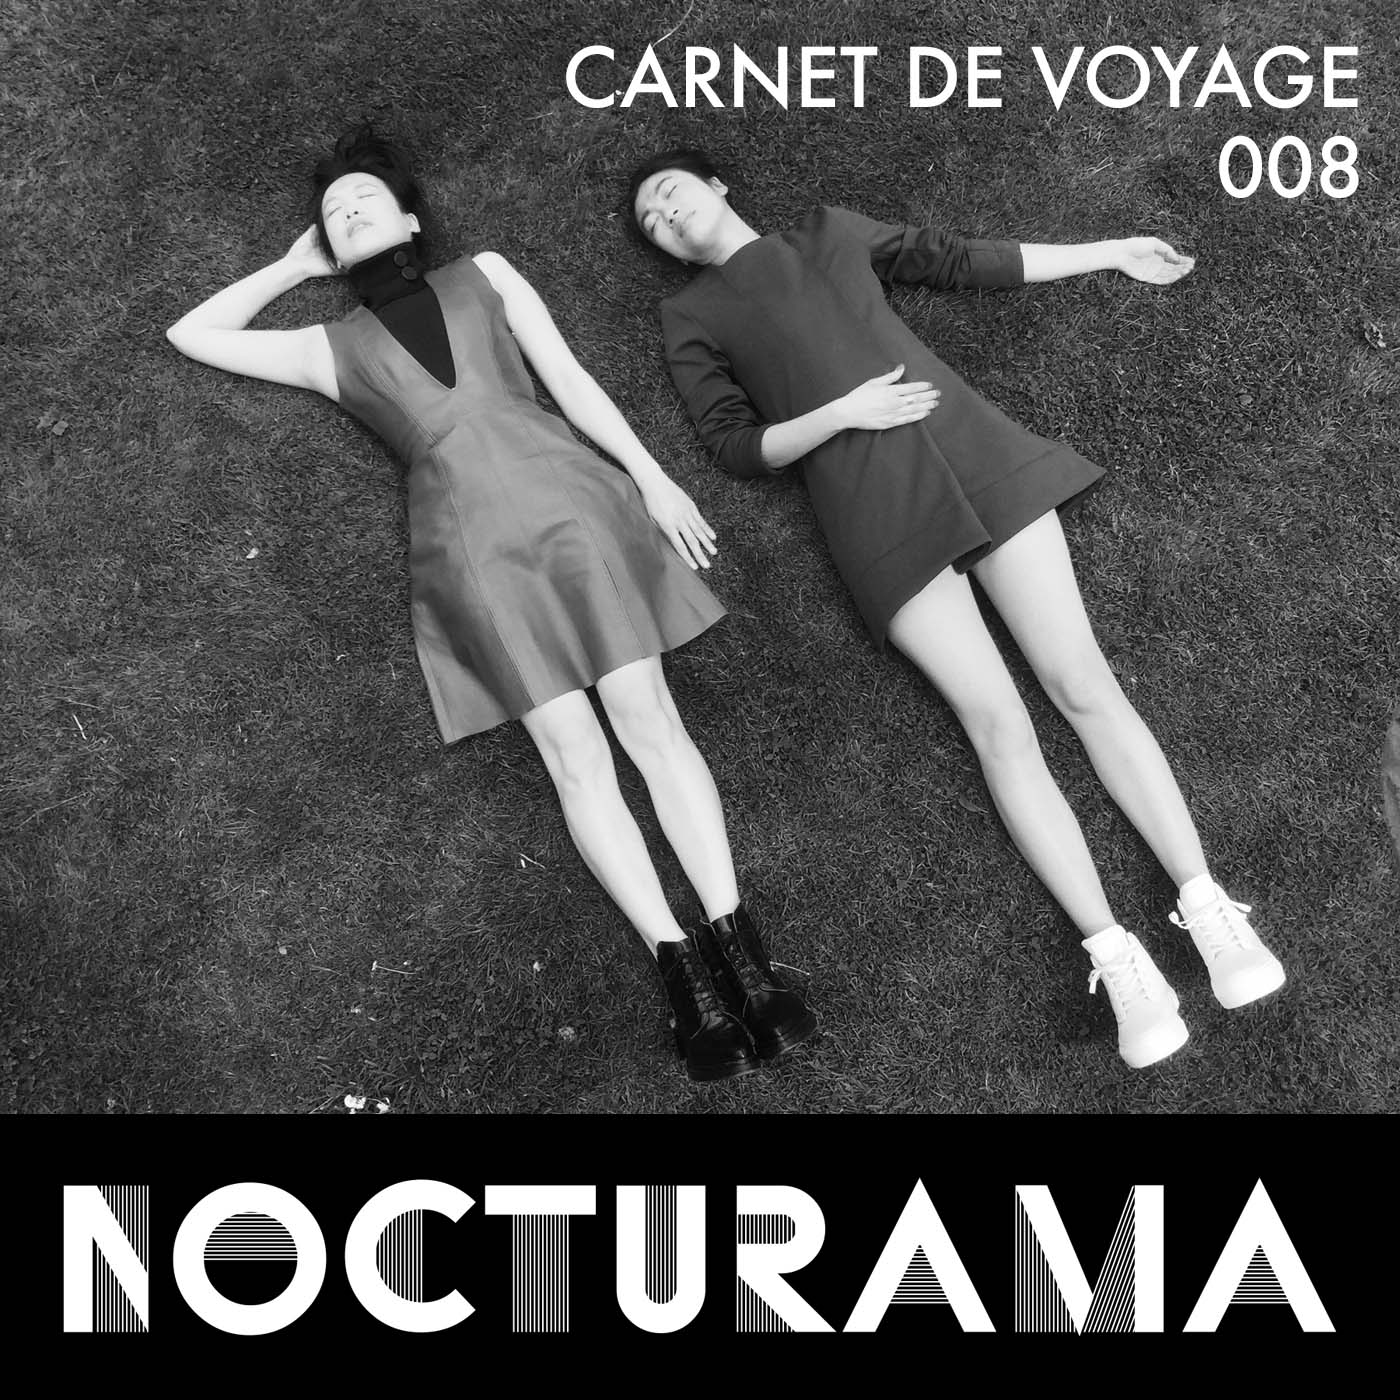 http://geist-agency.com/news-description/Nocturama008-Carnet-de-Voyage